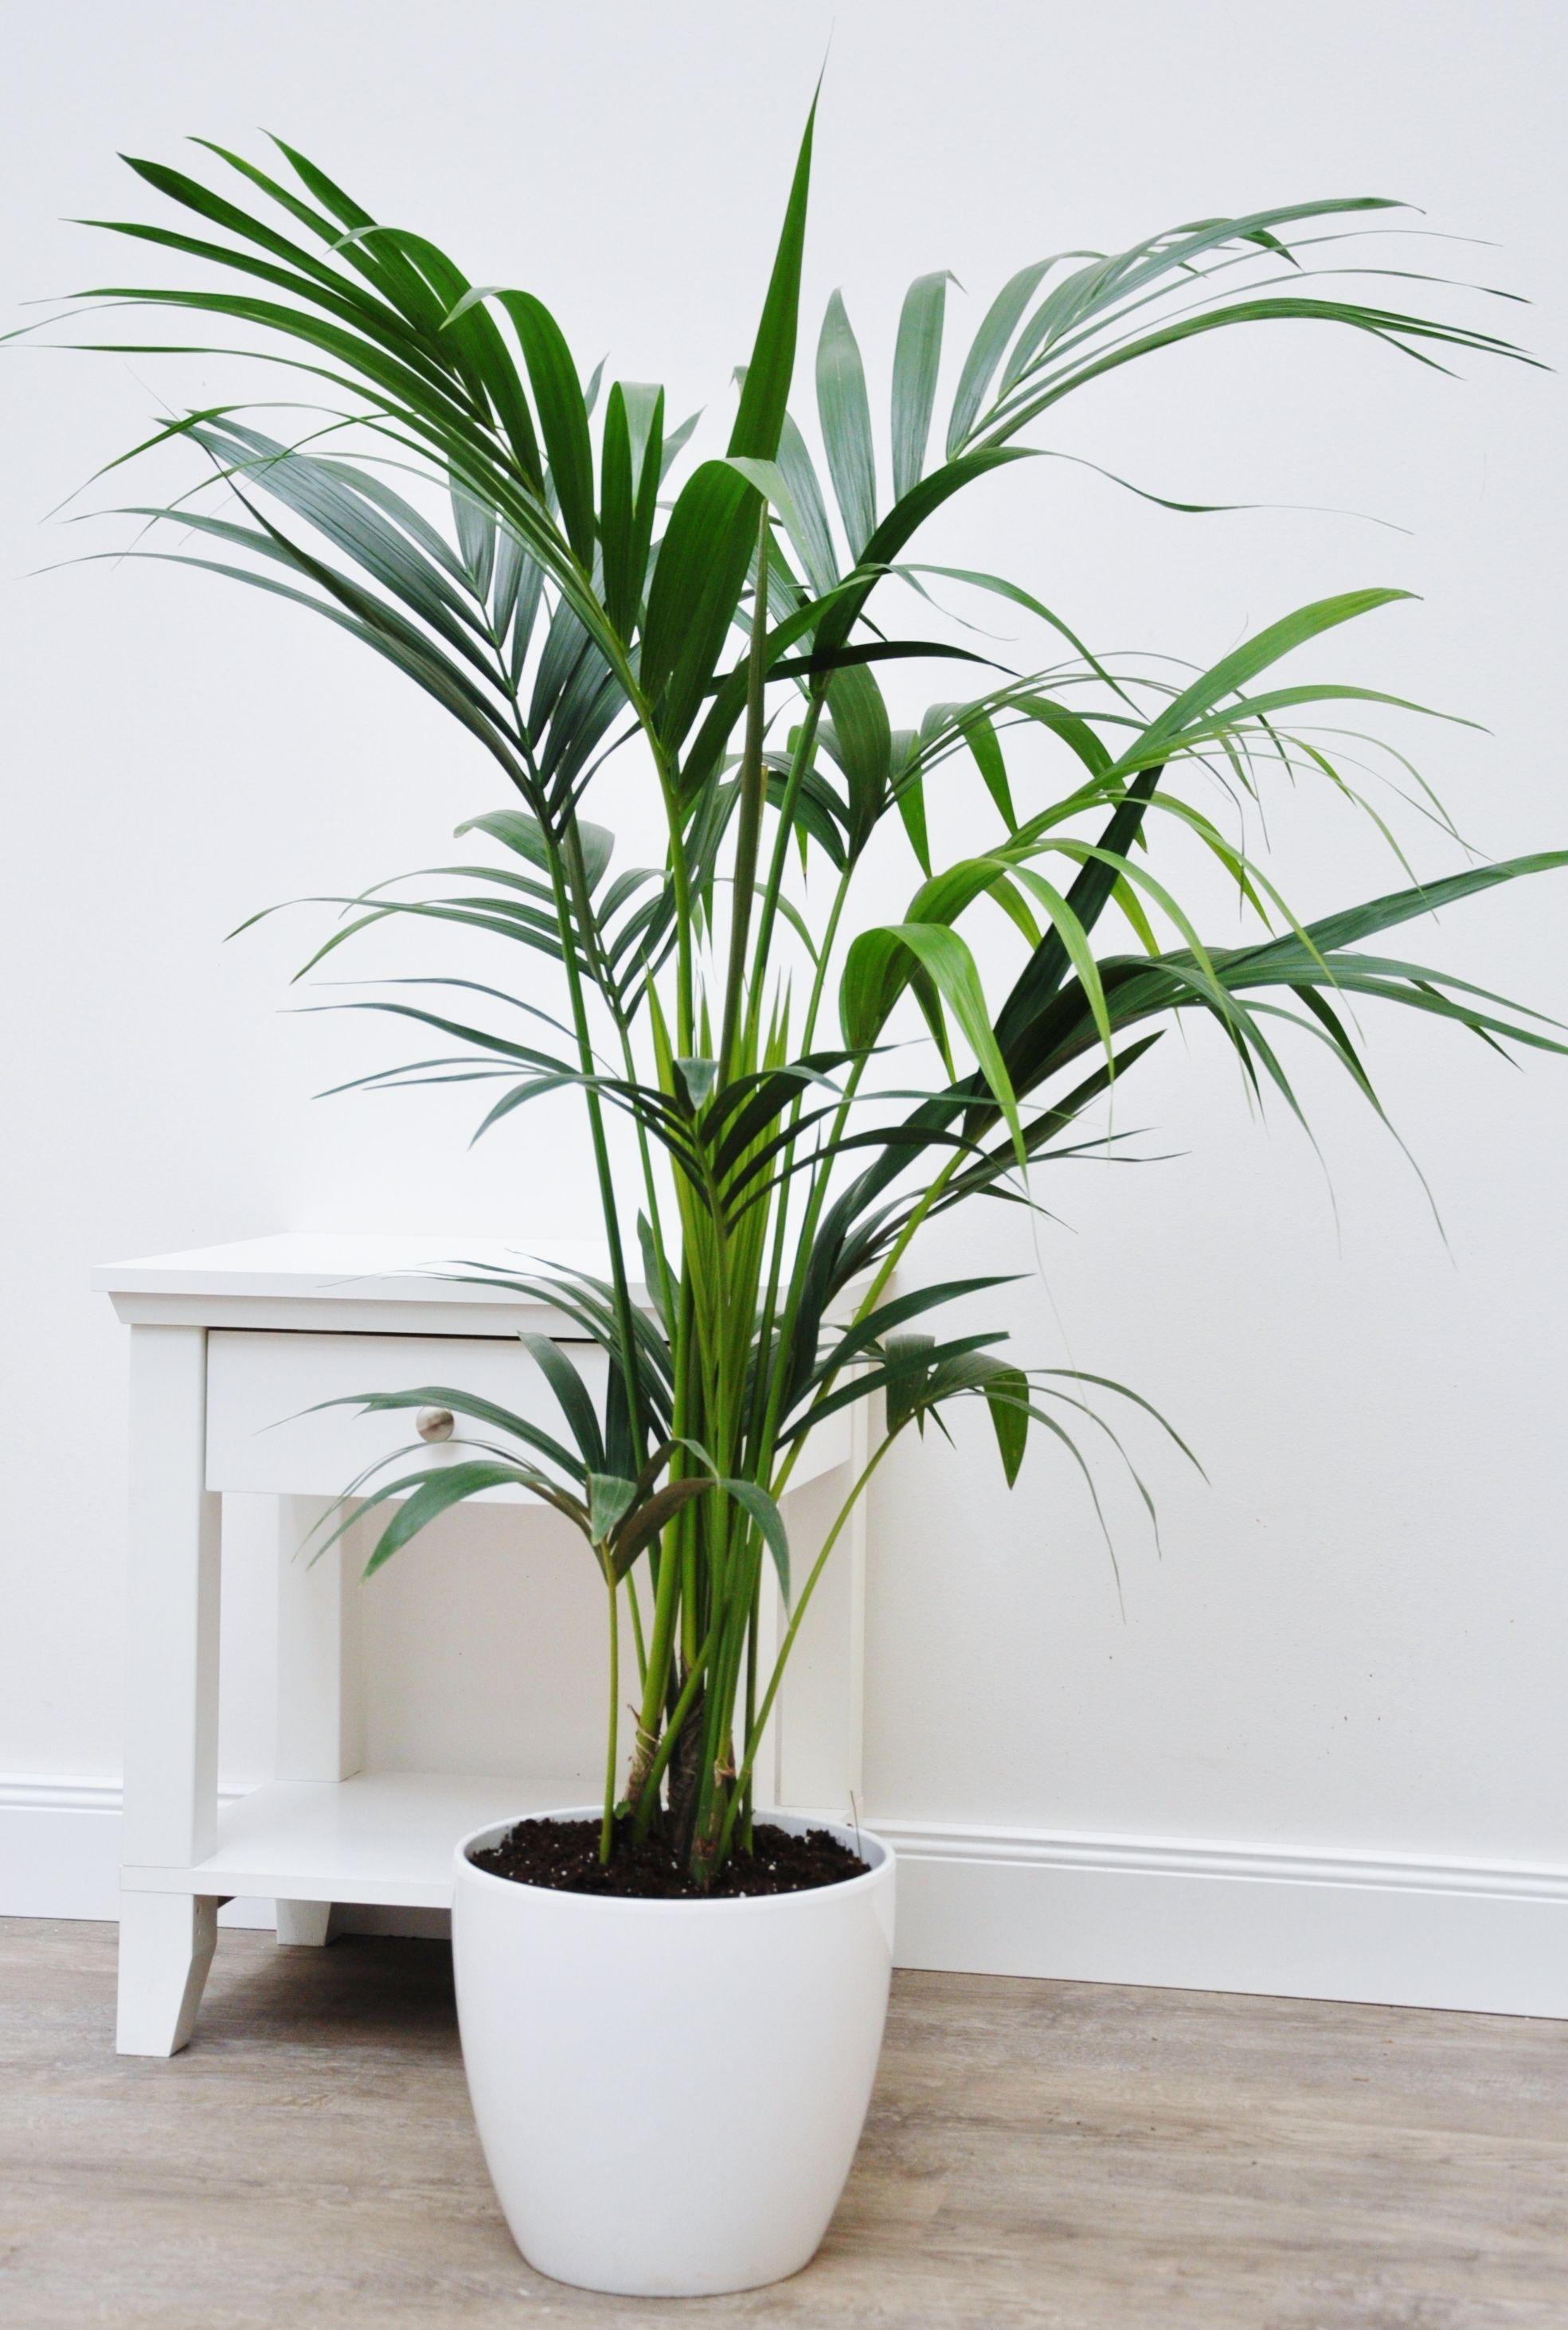 Kentia Palme Tropical House Plants Inside Plants Planting Flowers